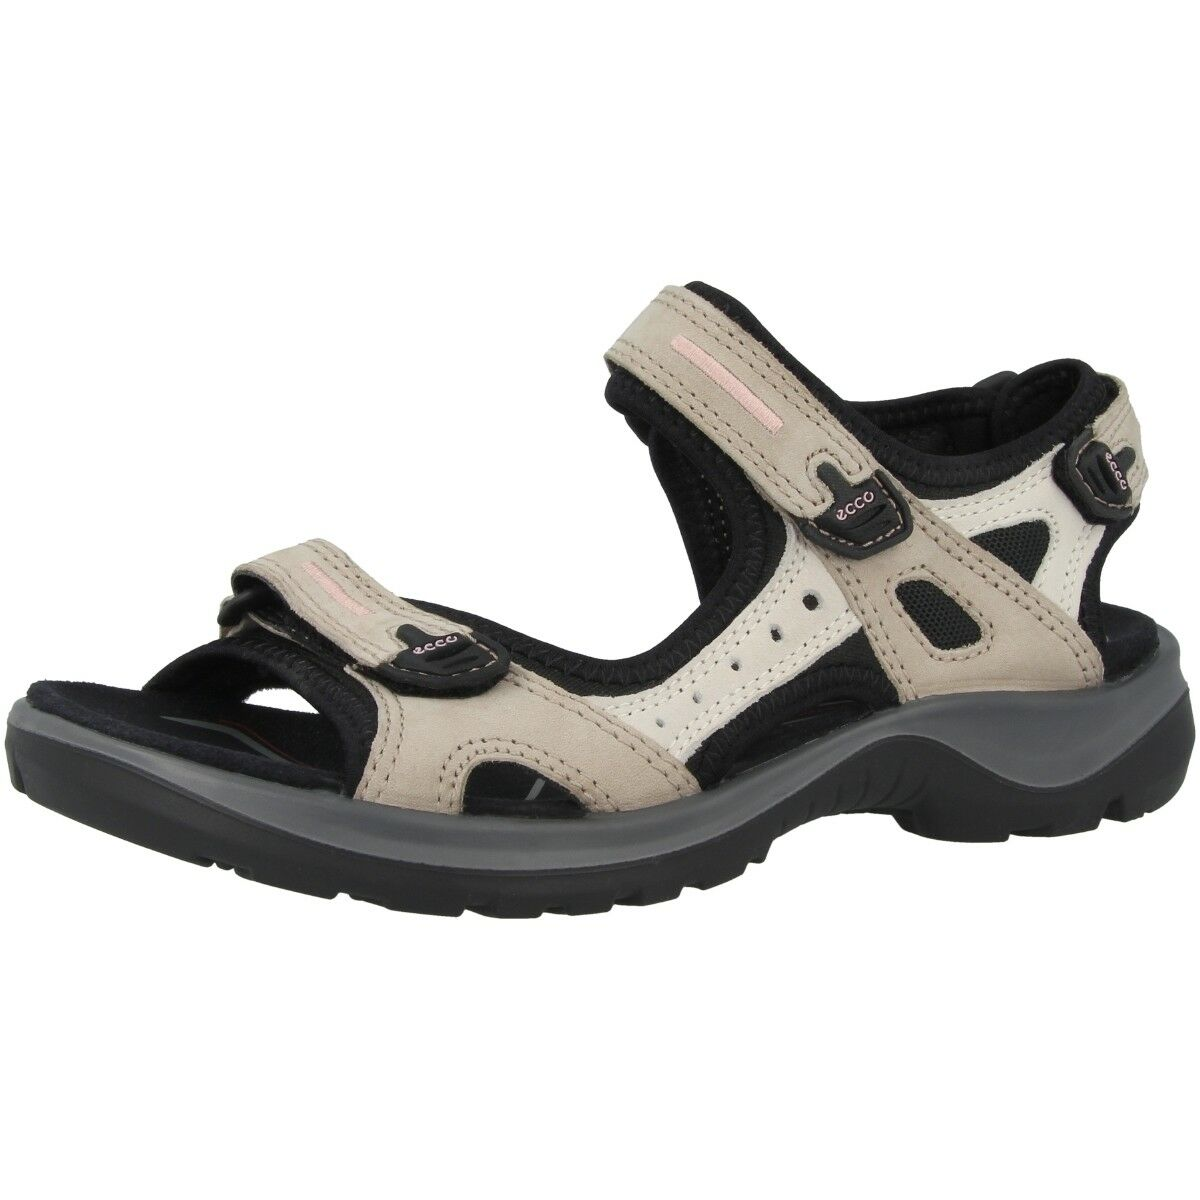 Ecco todoterreno Yucatan Ladies señora sandalia zapatos 069563-54695 trekking Outdoor